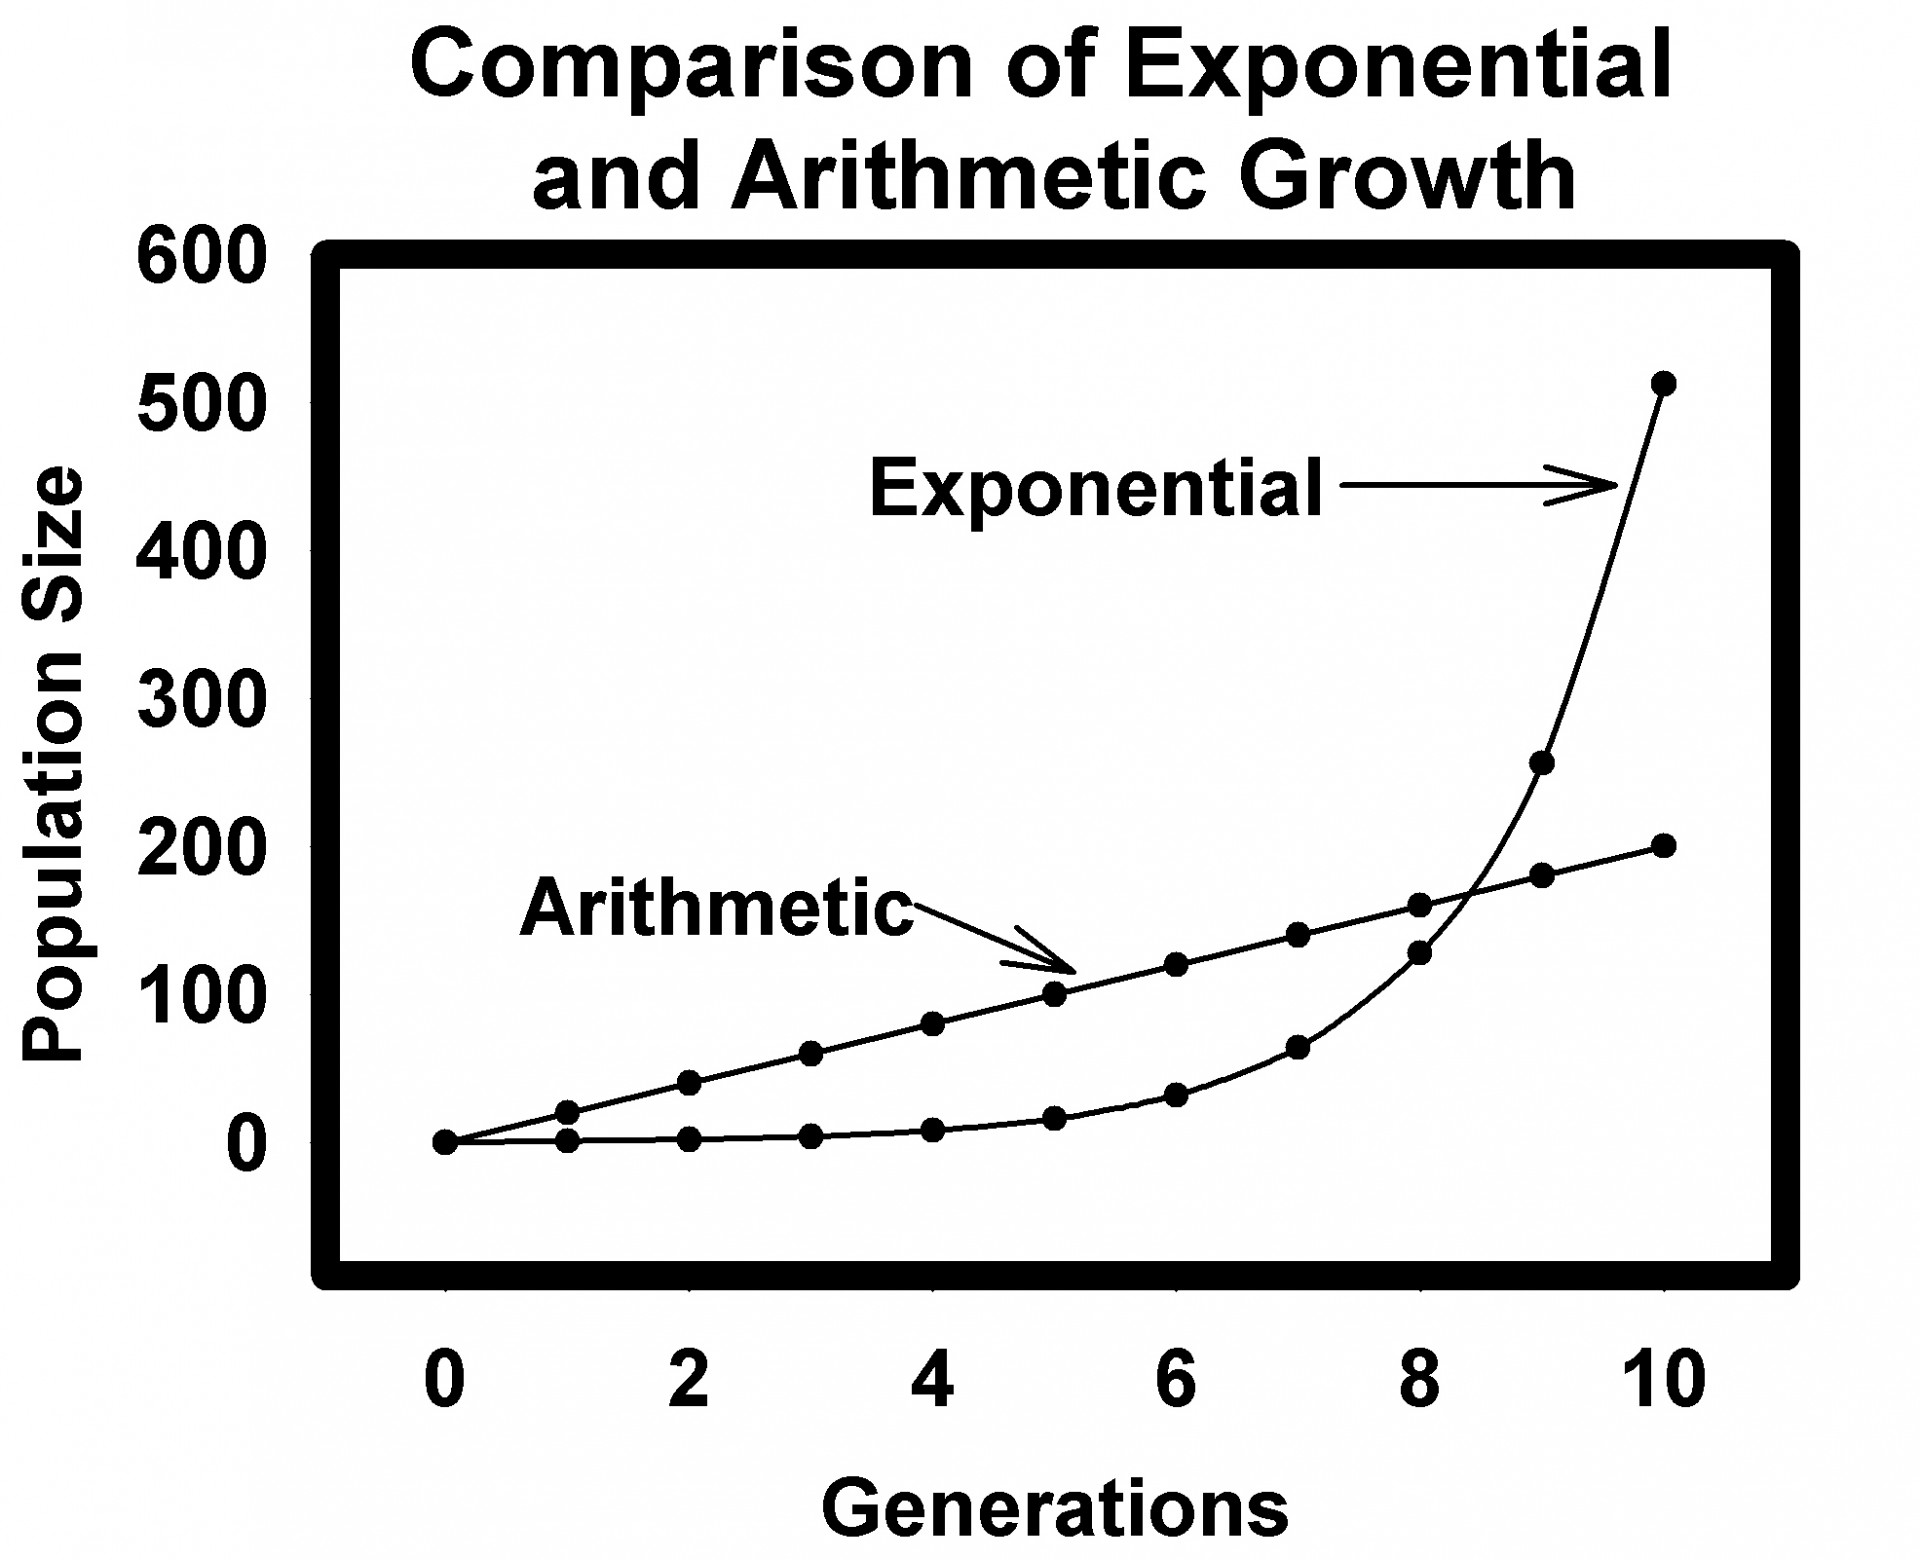 003 Malthusgrowthcurves Jpg Essay Example Thomas Malthus On The Principle Of Stupendous Population After Reading Malthus's Principles Darwin Got Idea That Ap Euro 1920